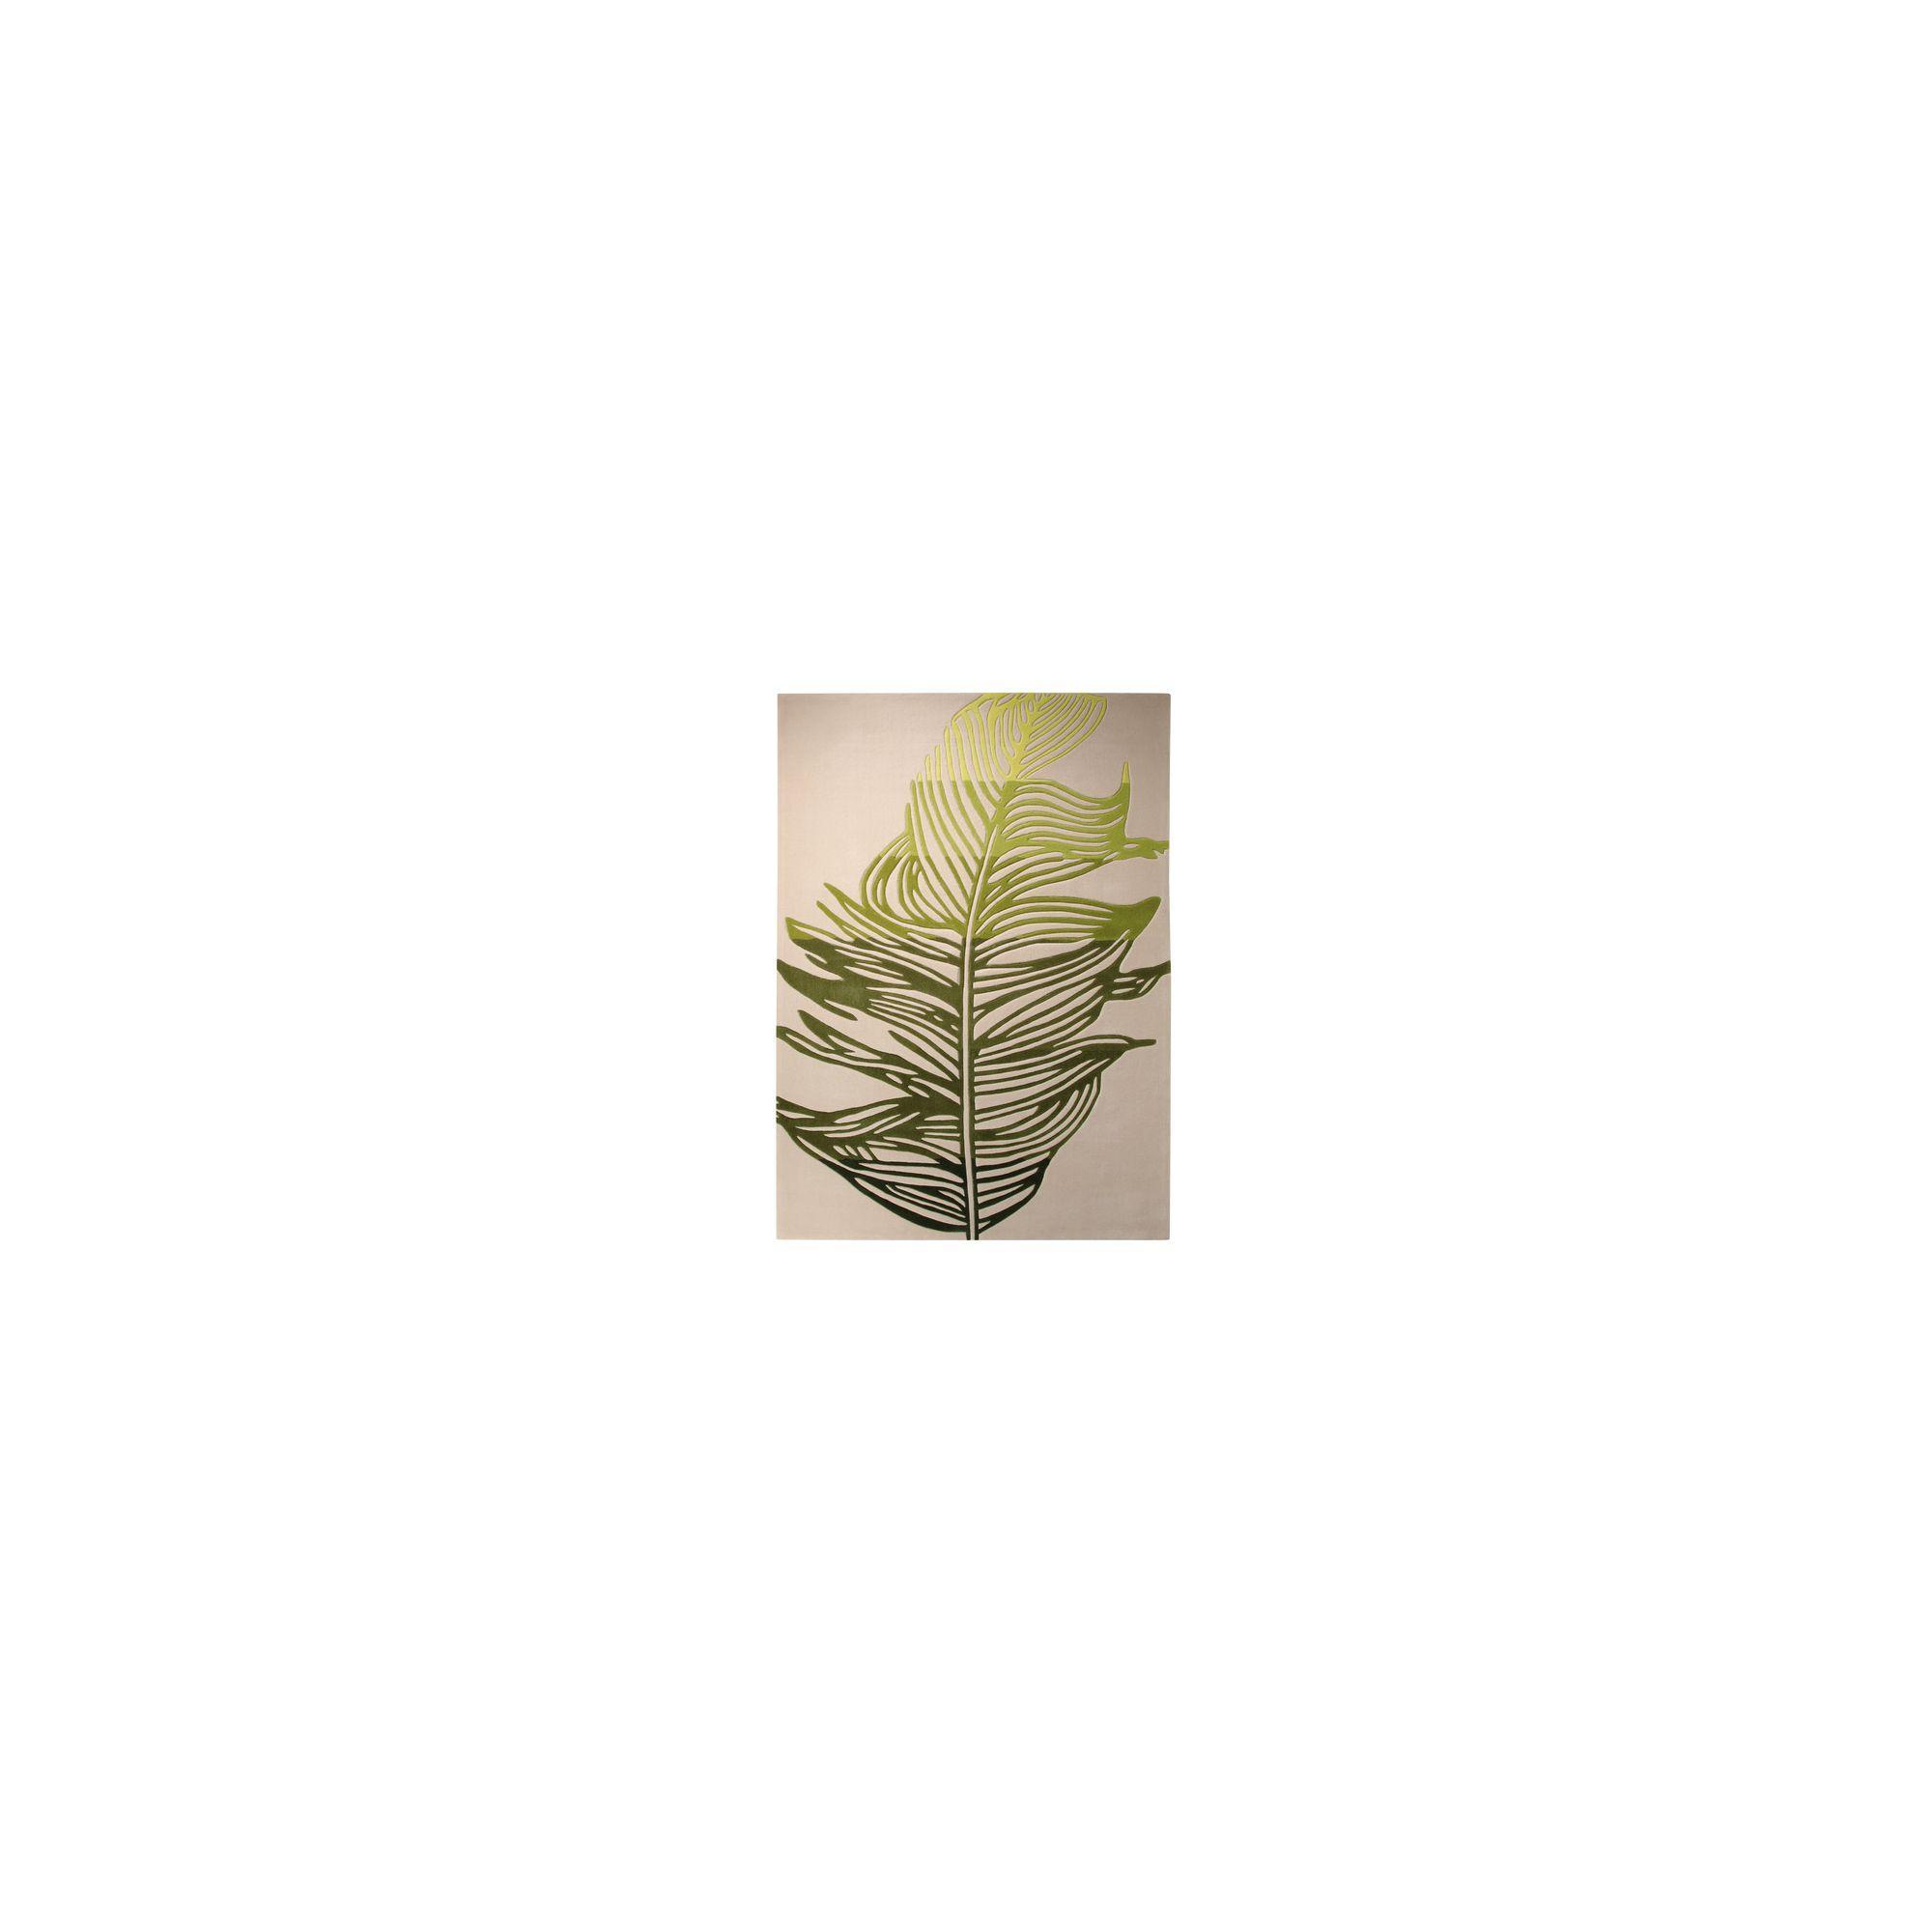 Esprit Feather Beige / Green Novelty Rug - 140cm x 200cm